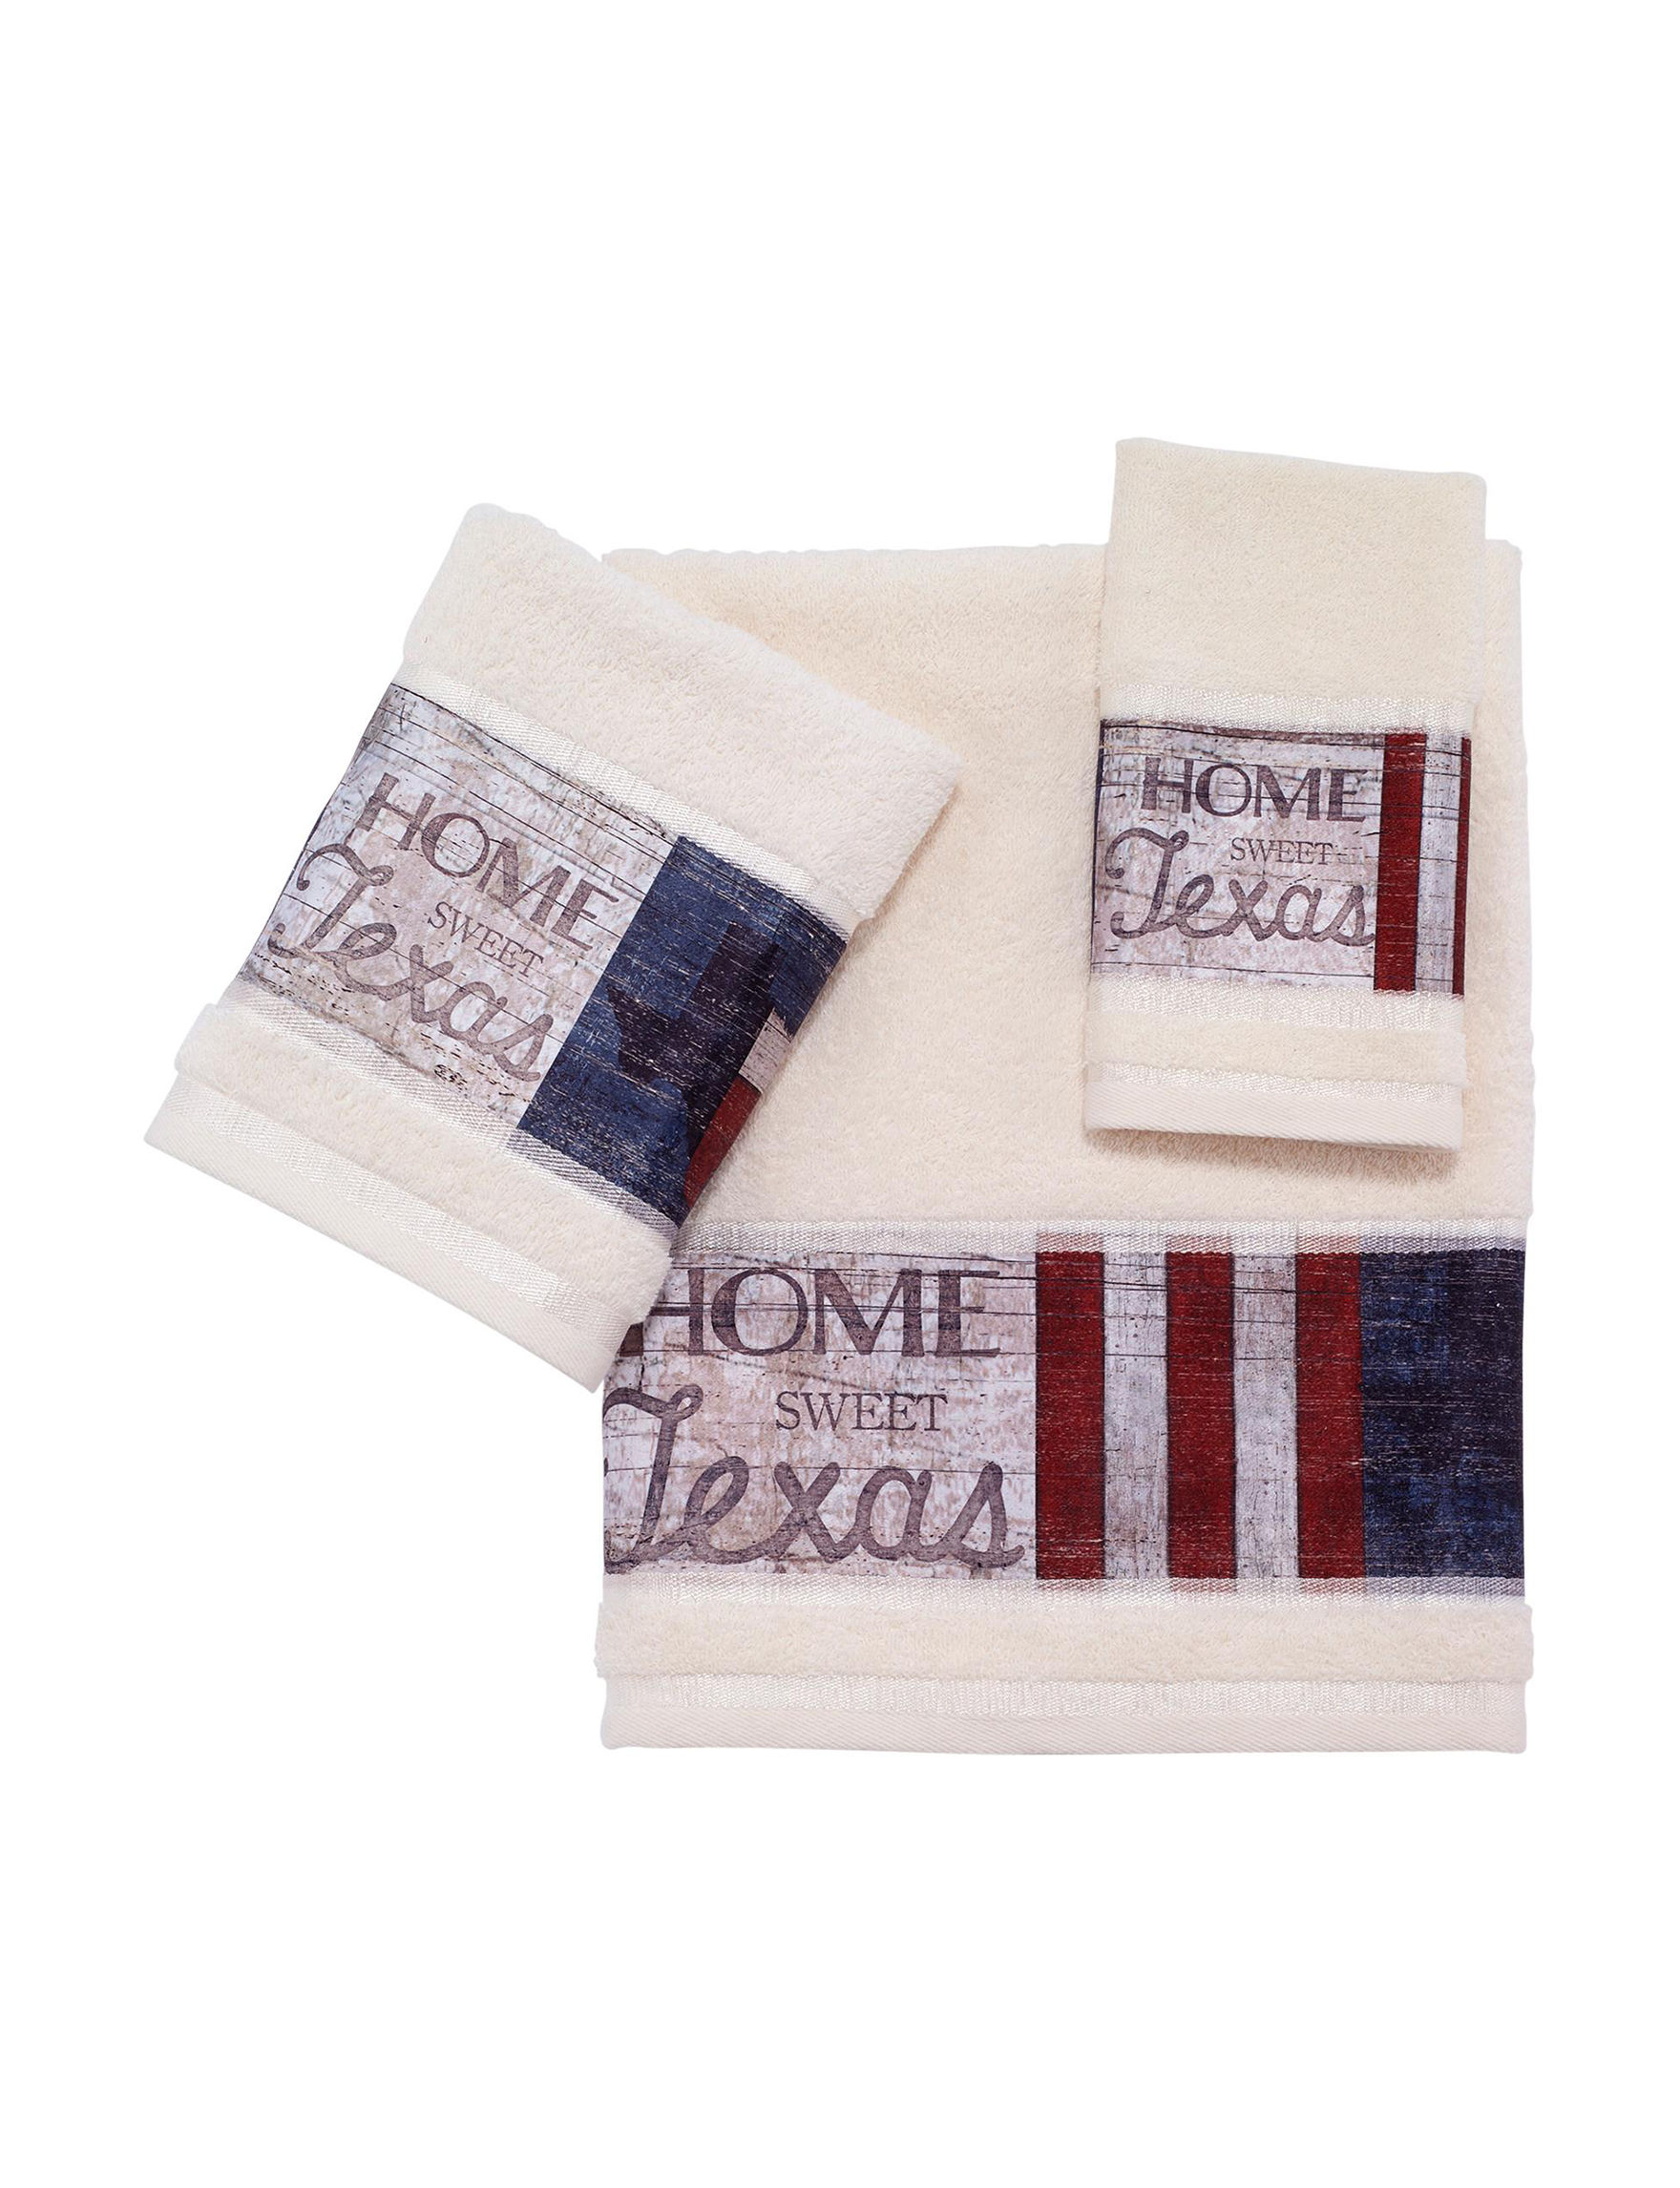 Avanti Cream Towel Sets Towels